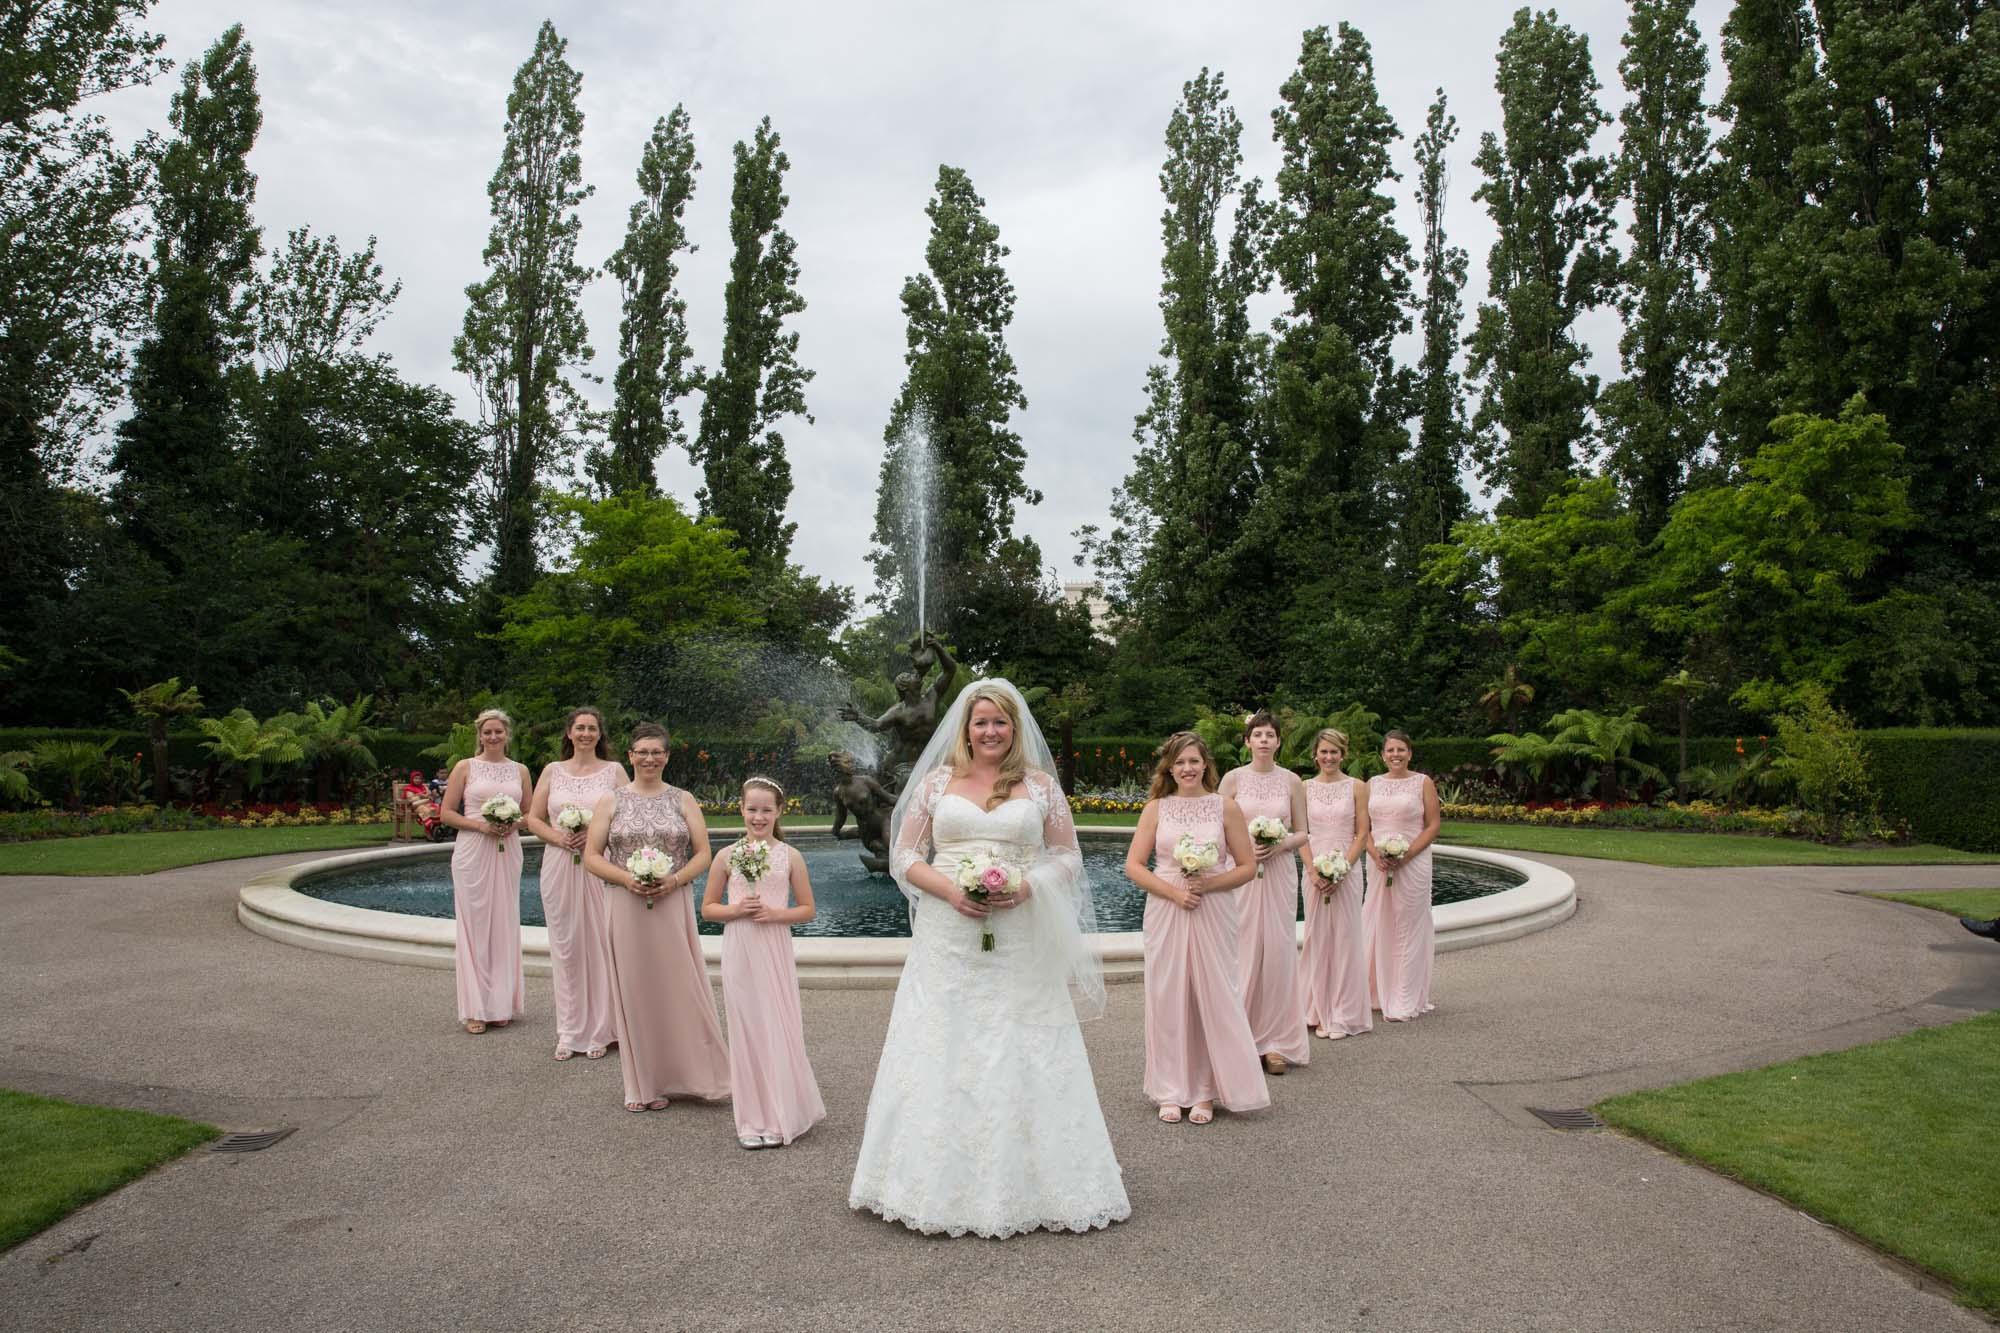 weddings-couples-love-photographer-oxford-london-jonathan-self-photography-55.jpg